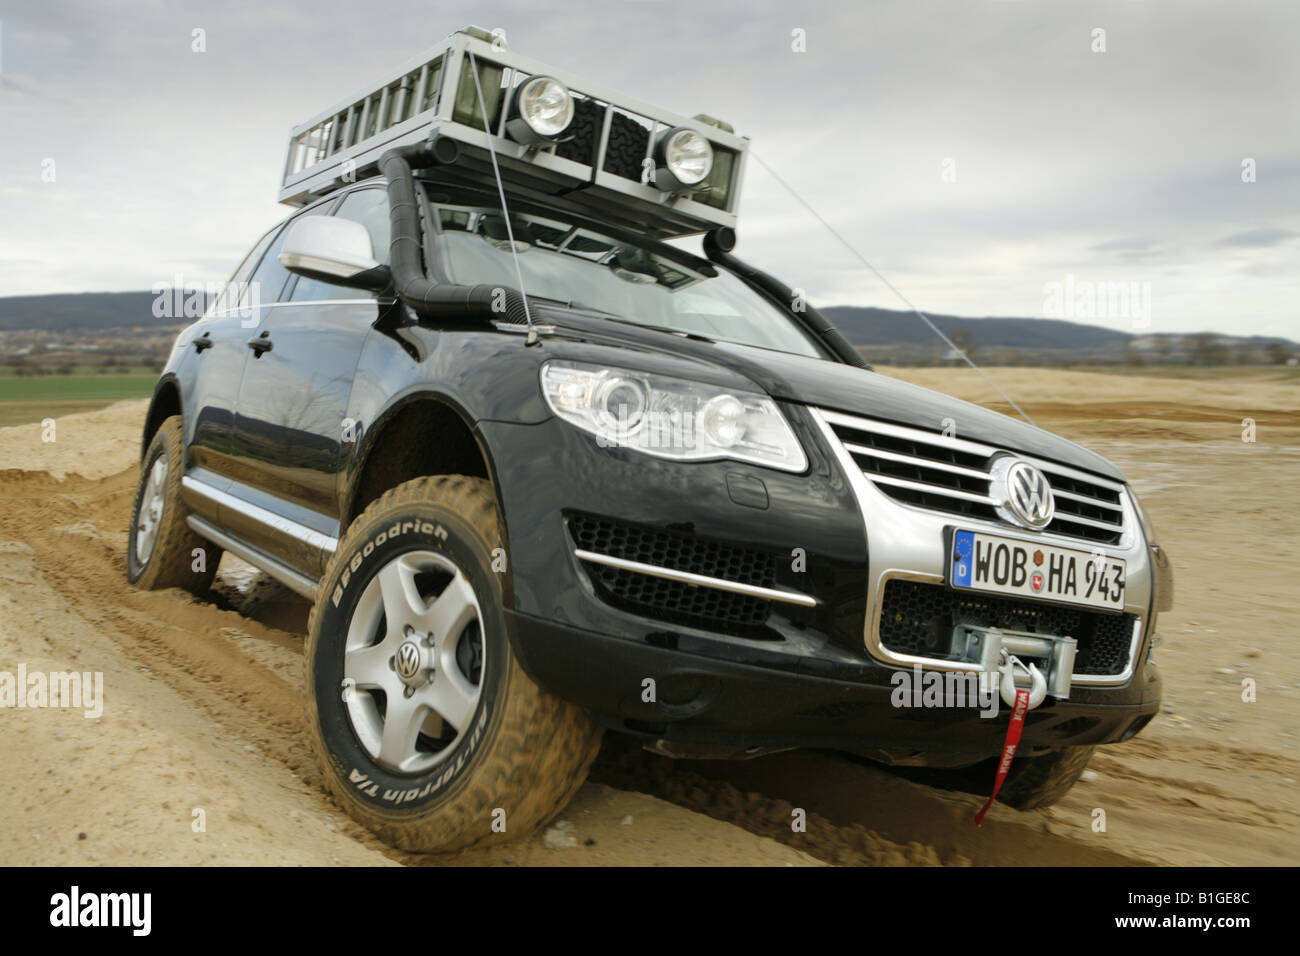 Volk Wagon Volkswagen Offroad